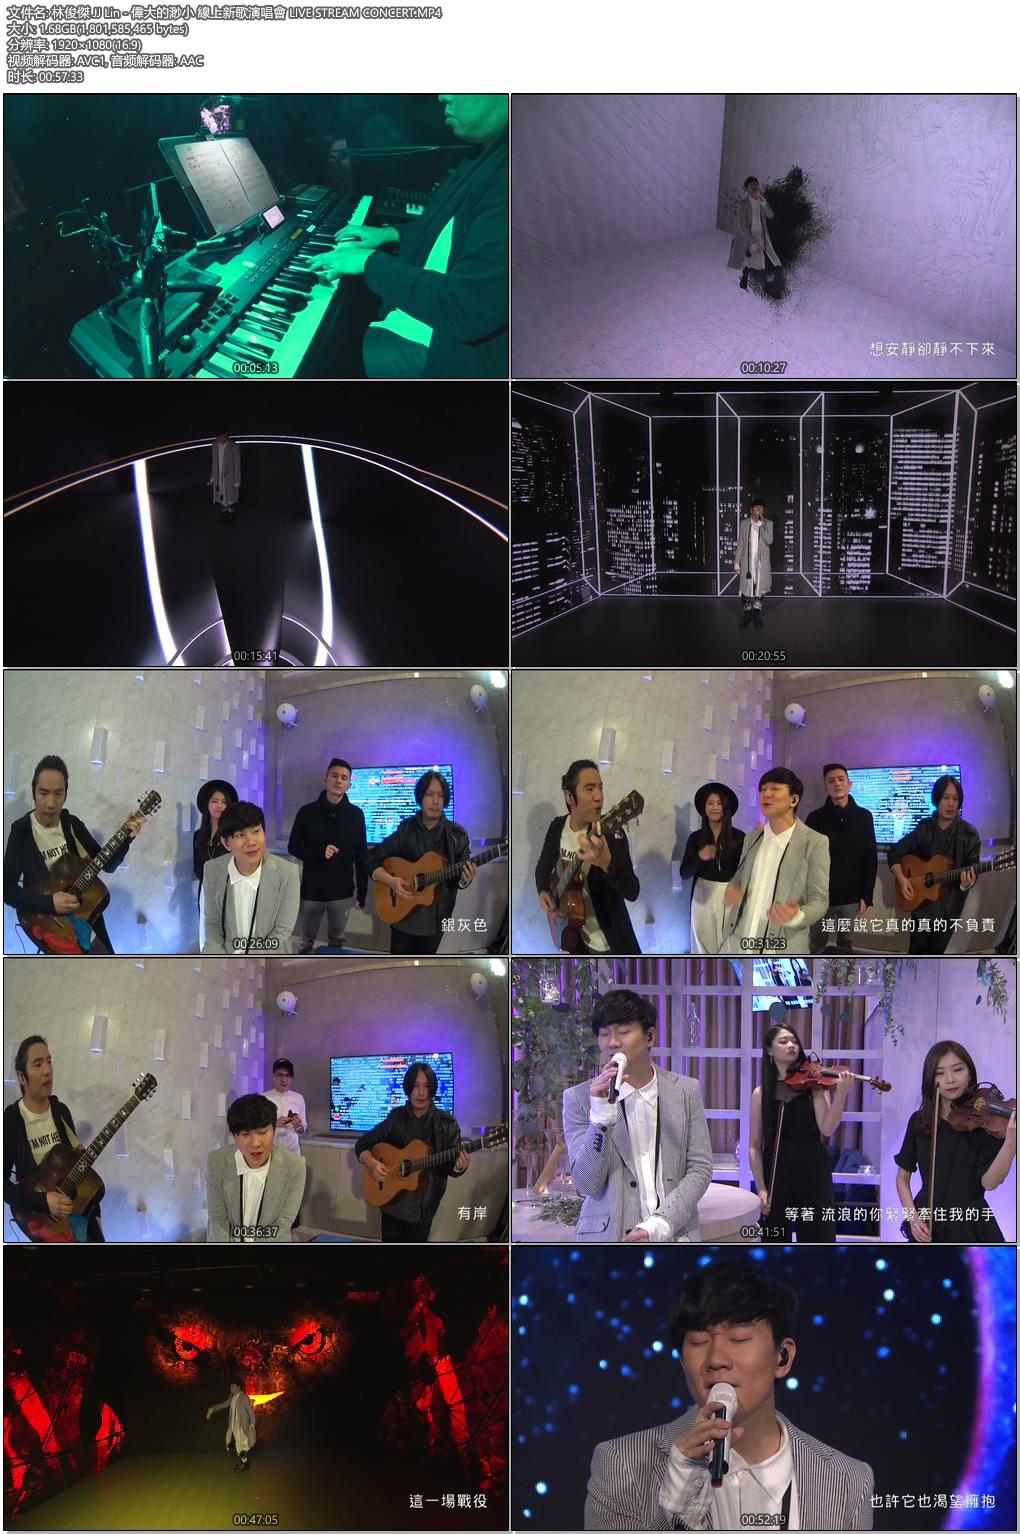 [1080P]  林俊杰 JJ Lin - 伟大的渺小 线上新歌演唱会live